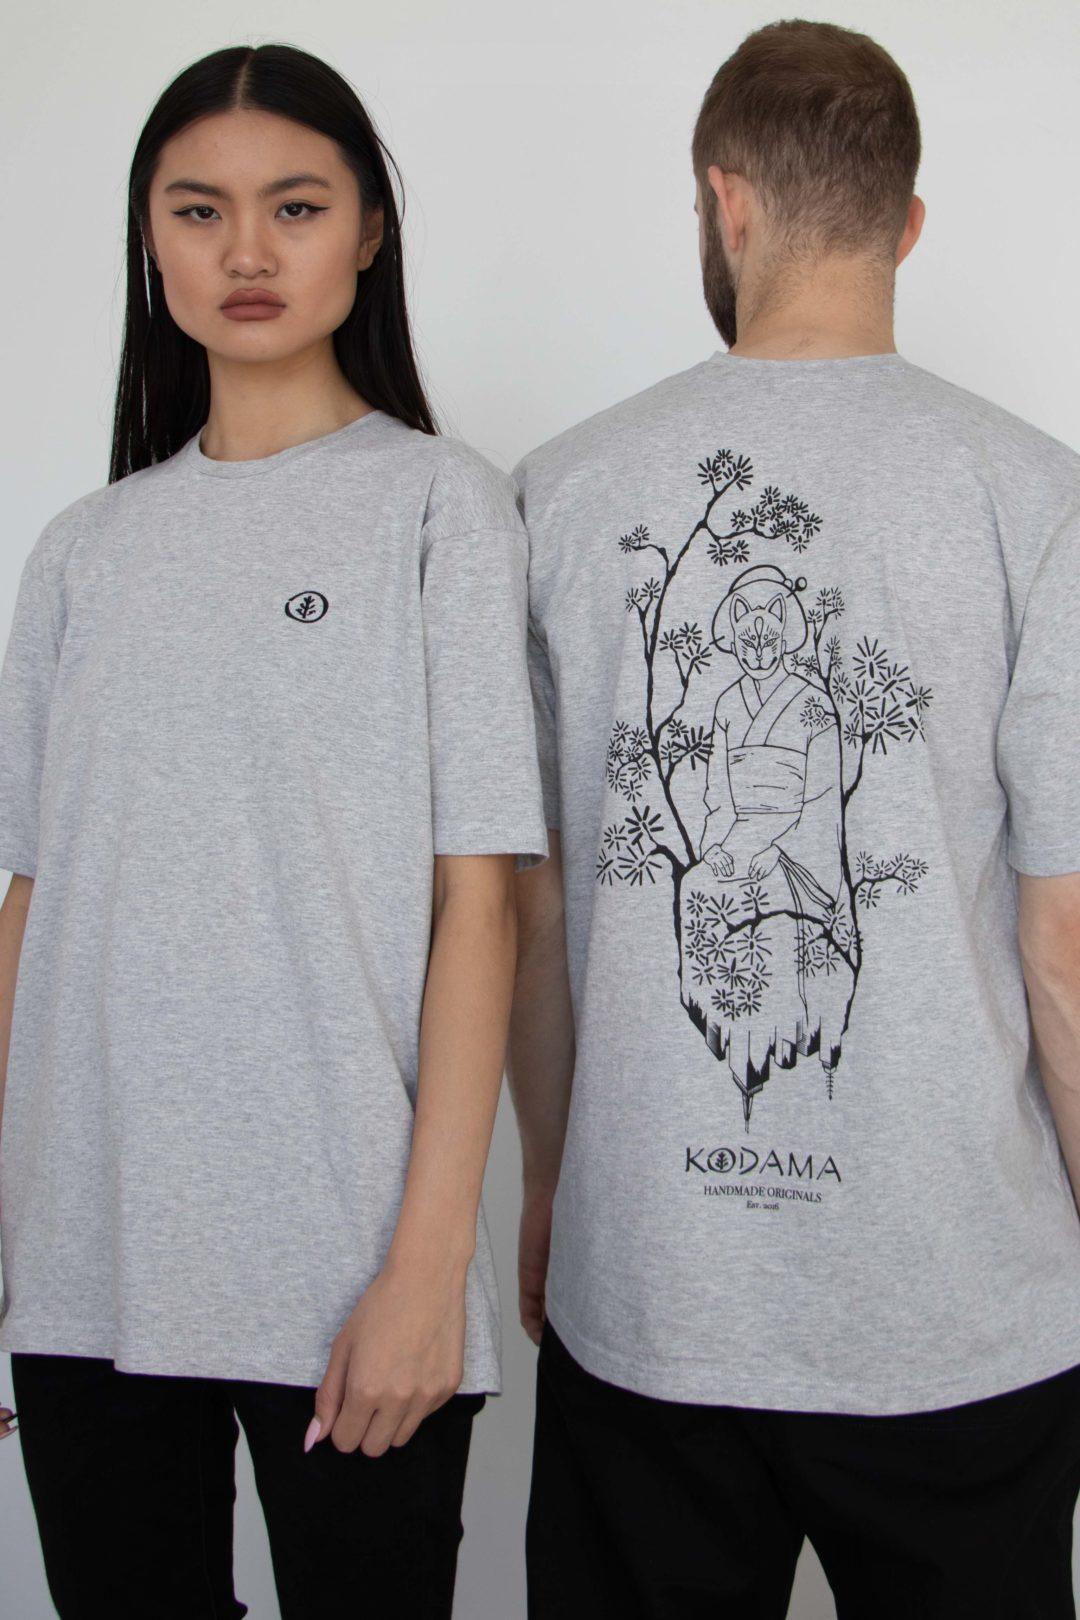 australian made organic cotton t-shirt